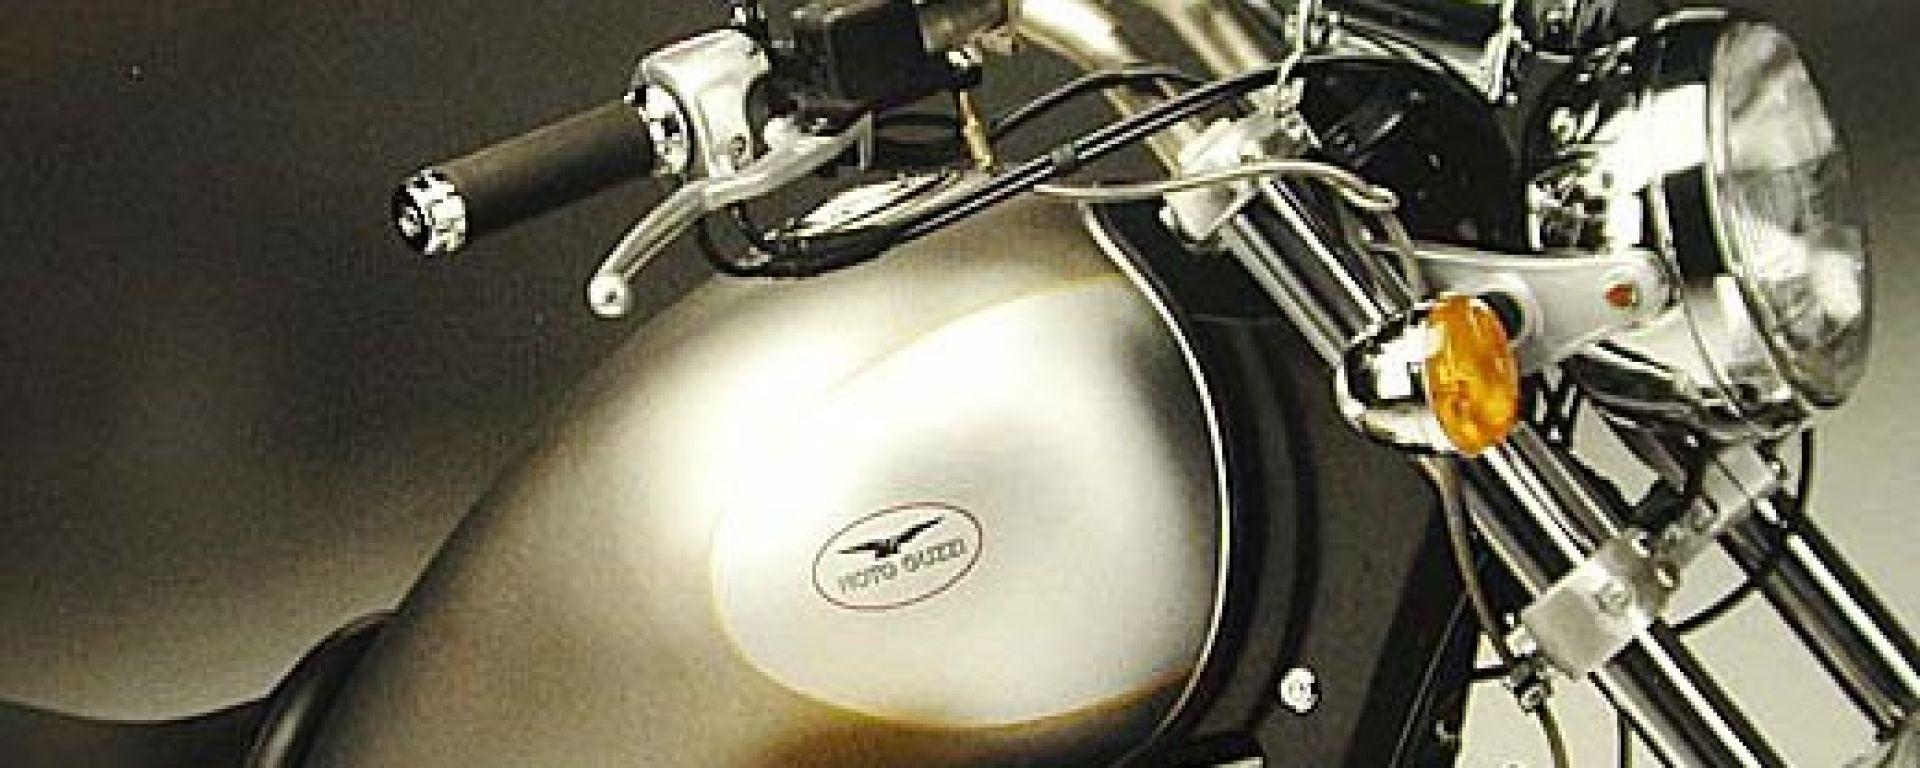 Moto Guzzi <BR>California Sport Special Aluminium